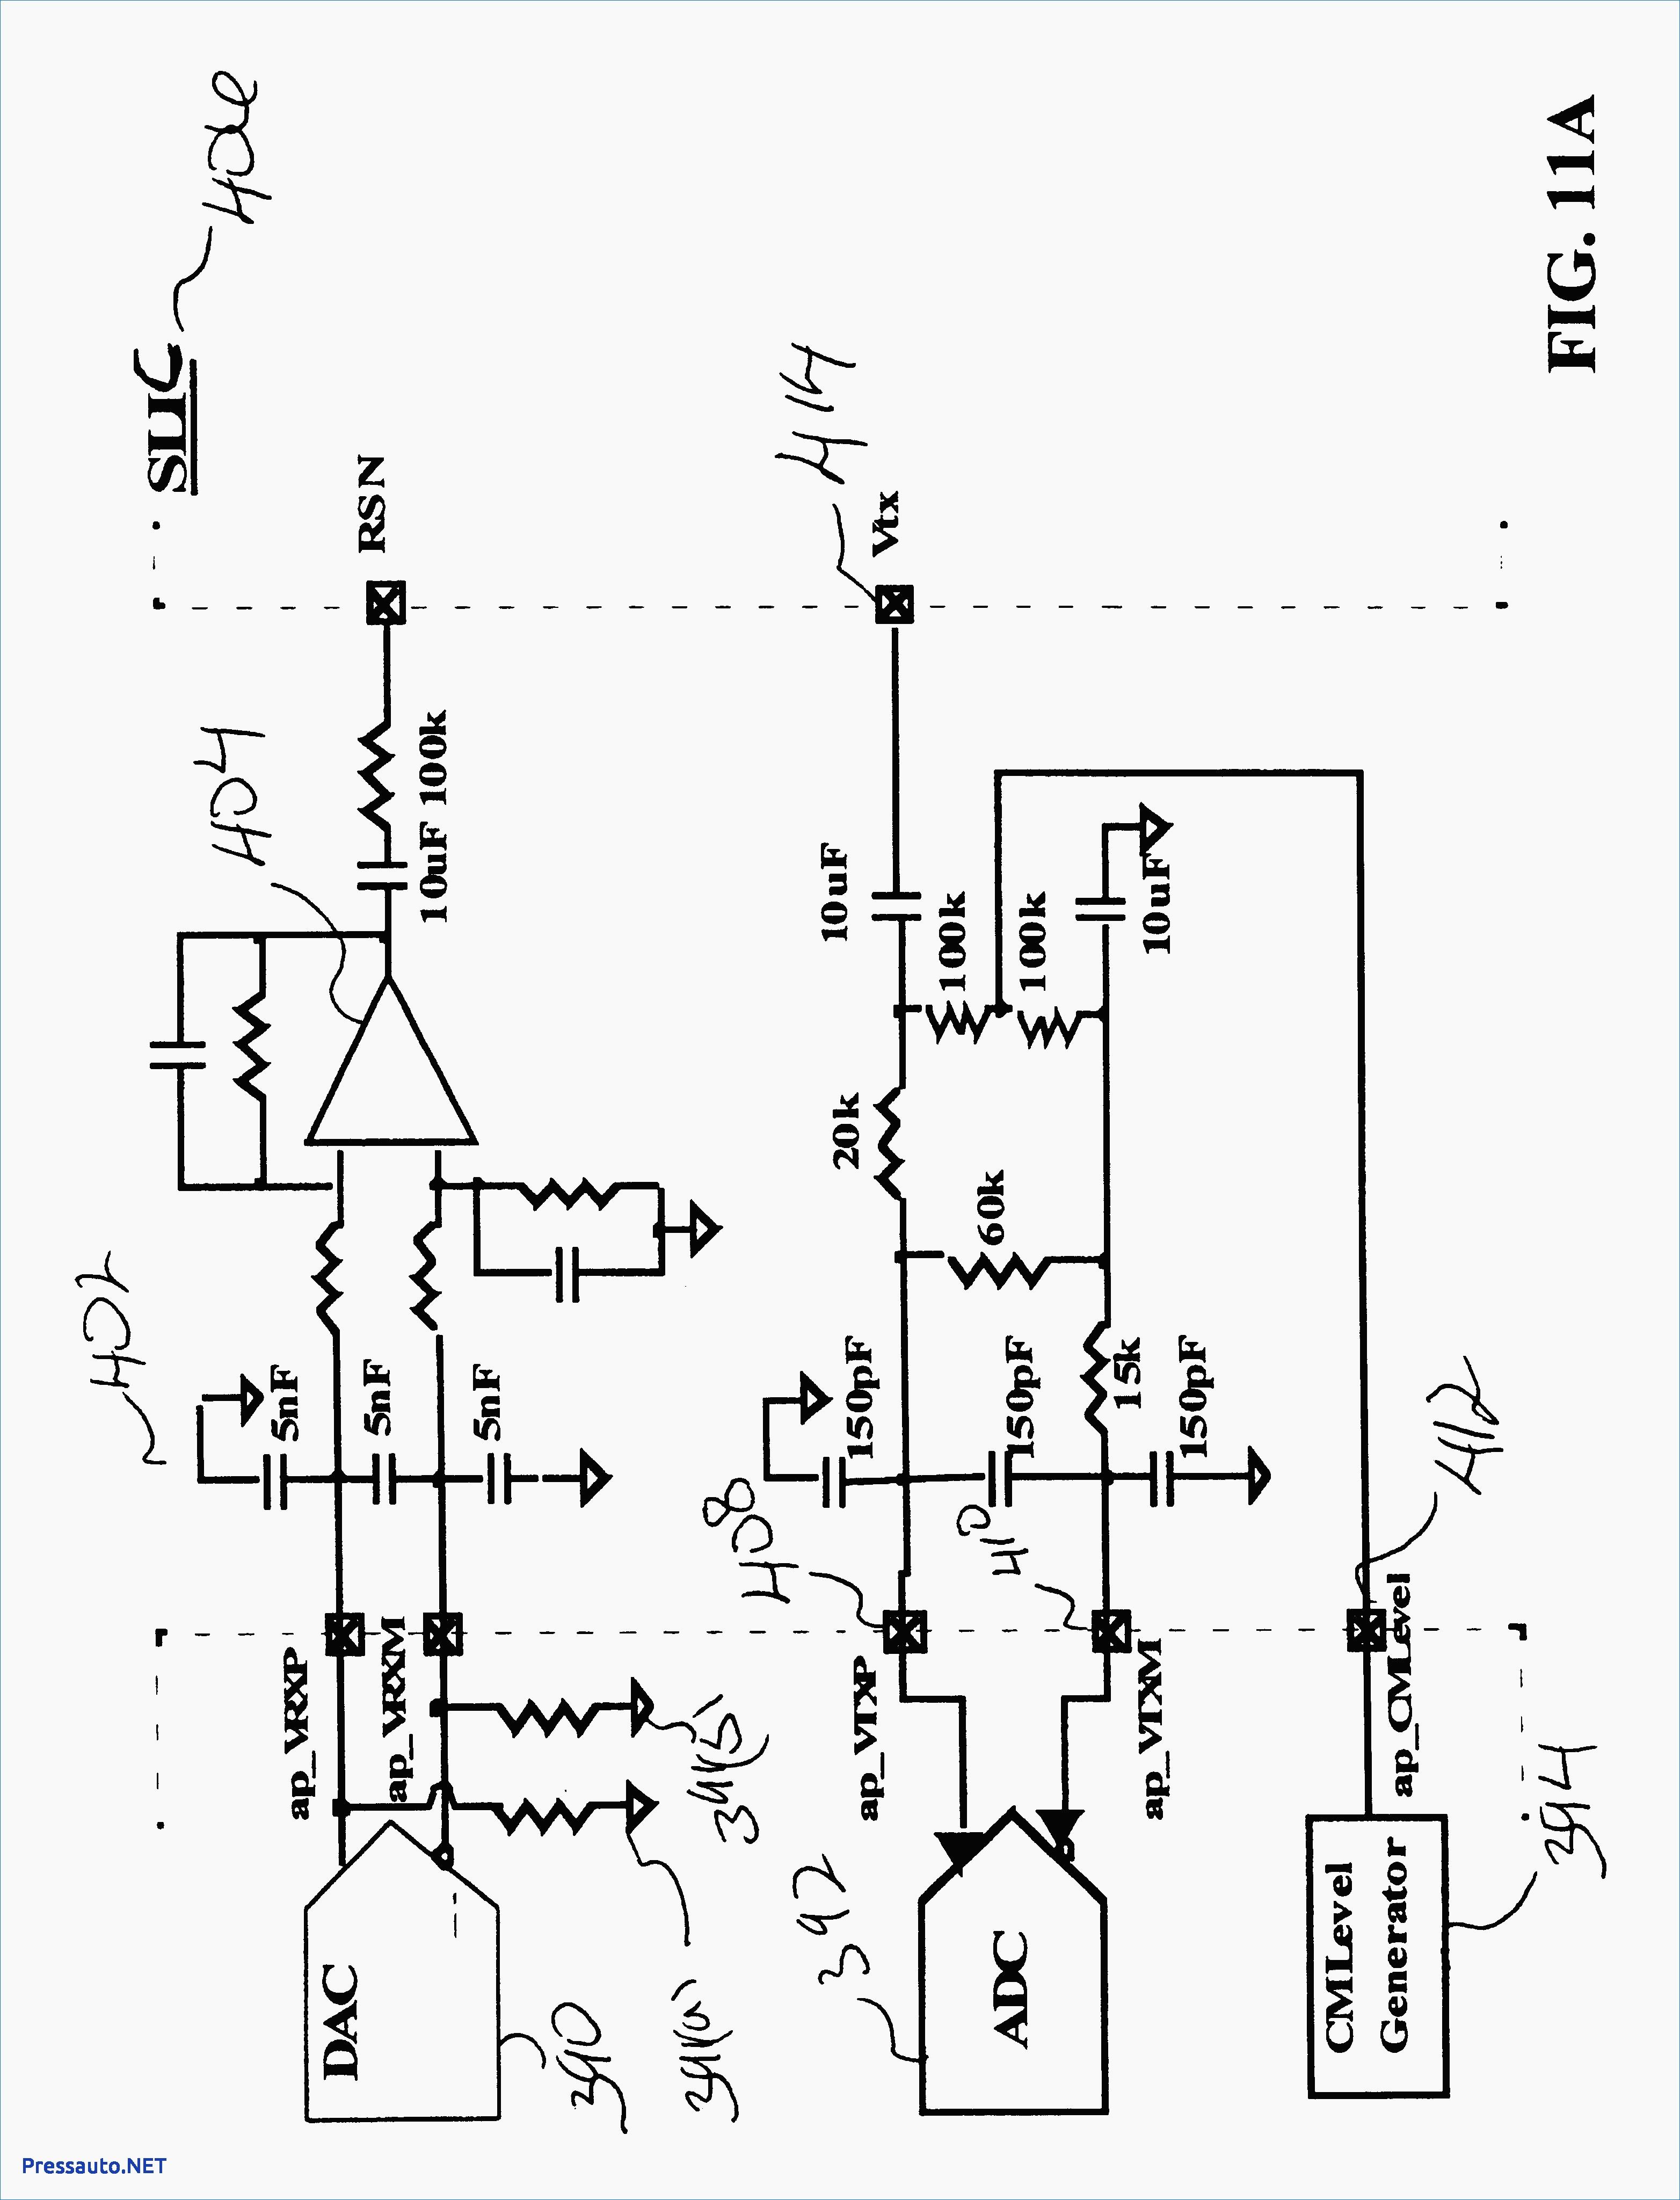 220v single phase transformer wiring diagram